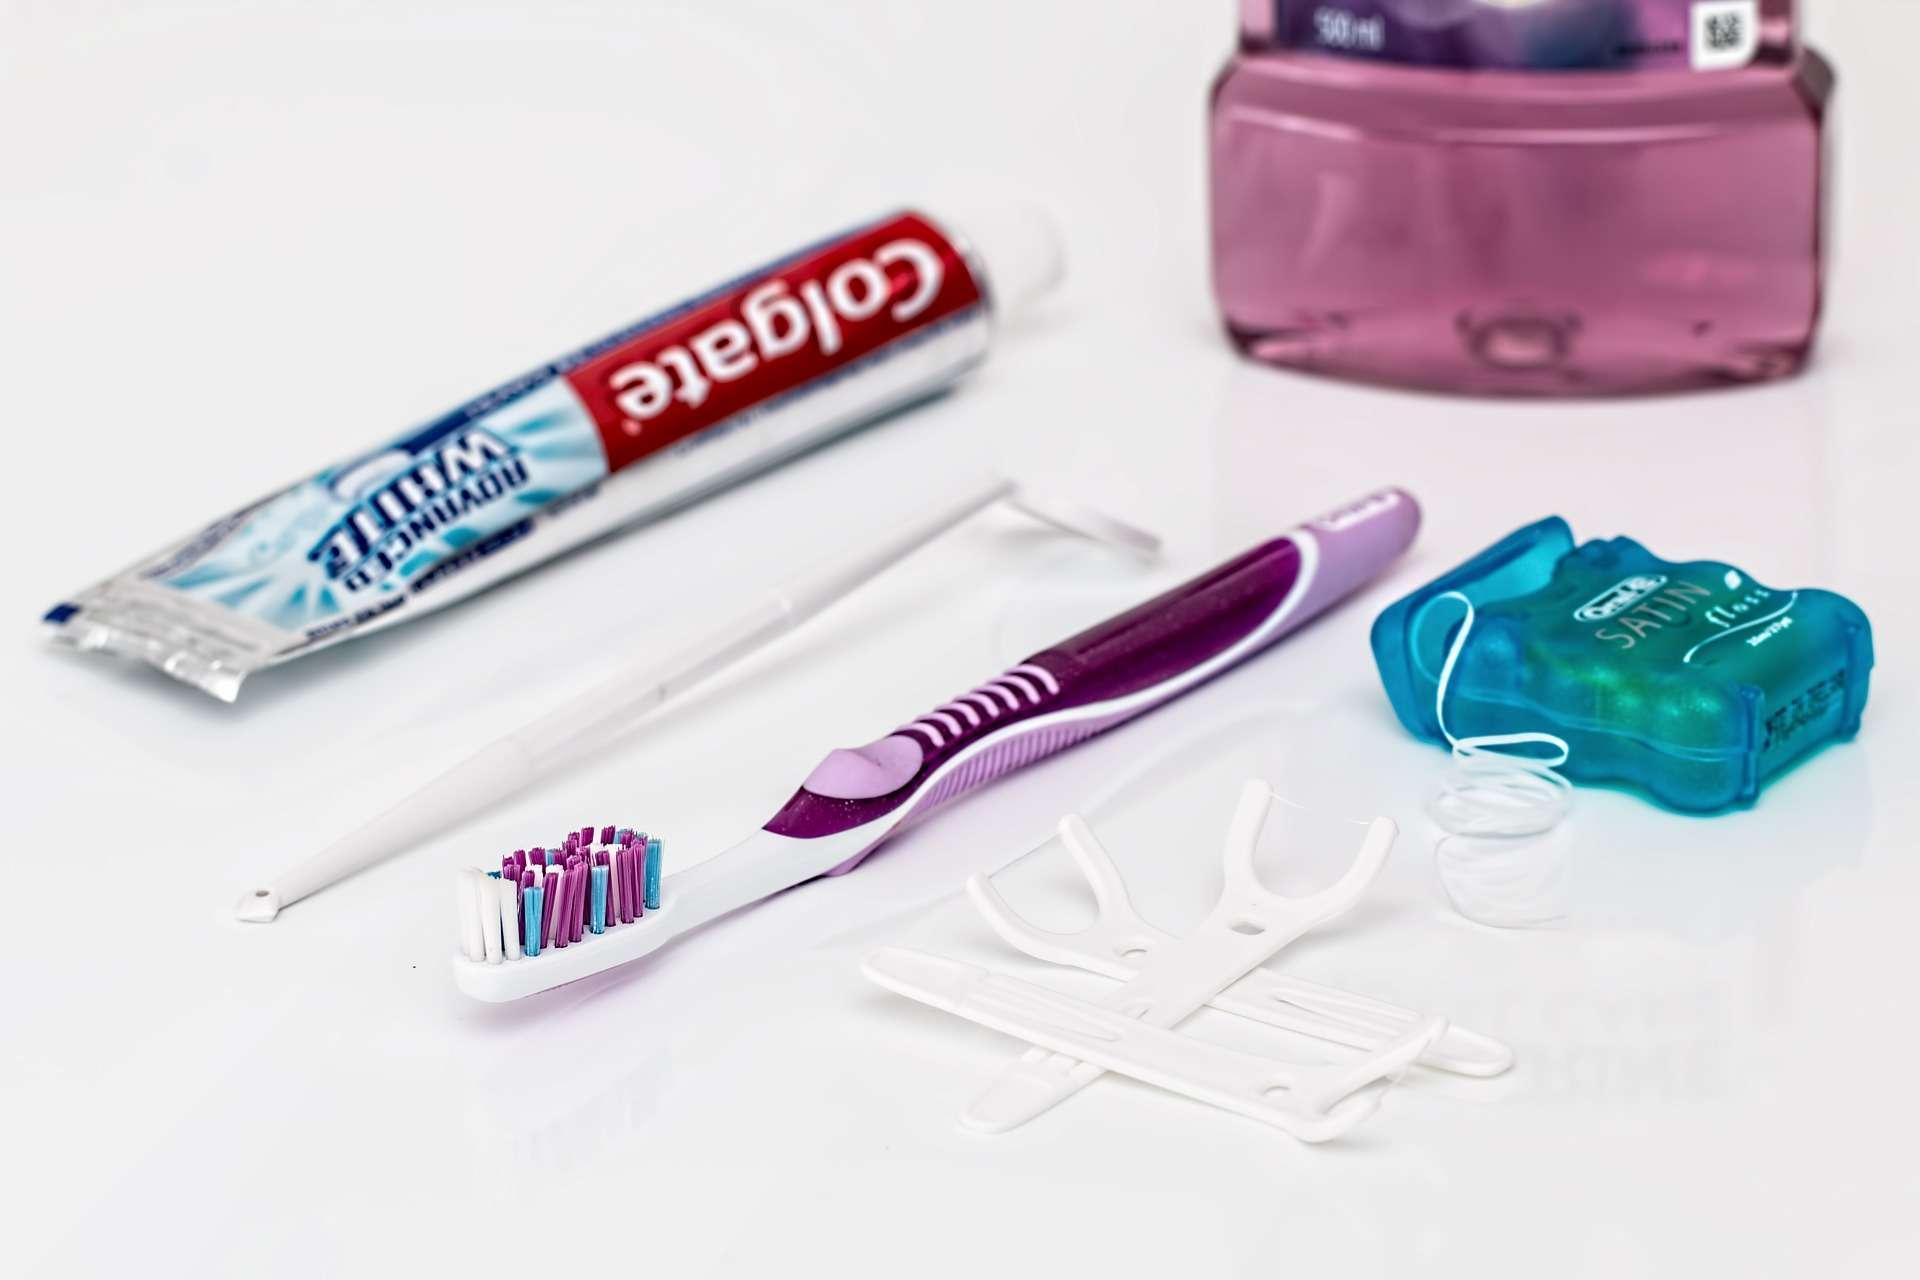 Flossing 101: The Key to Healthy Teeth